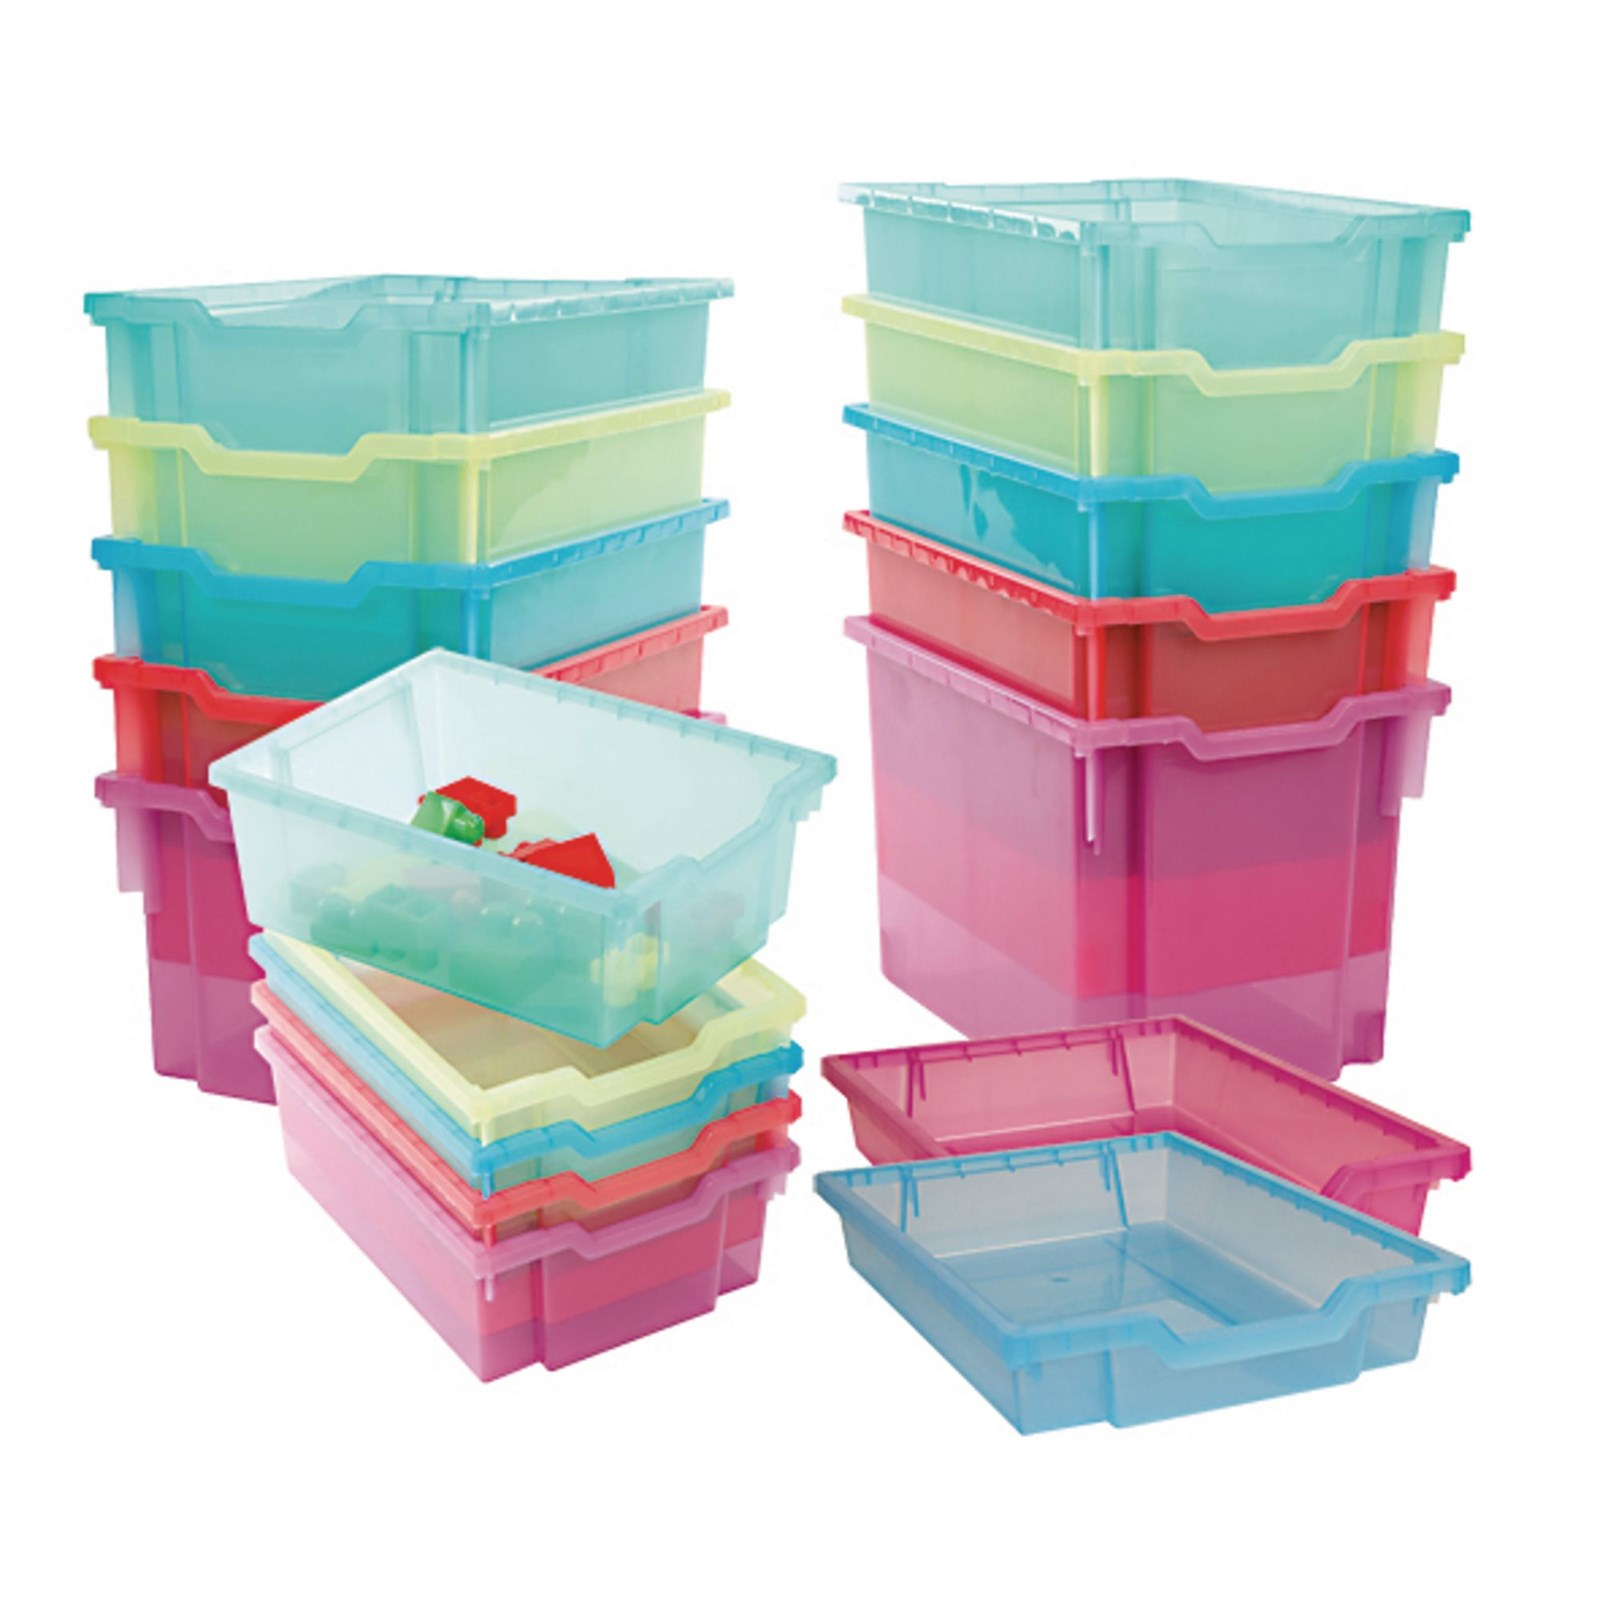 Gratnells Jumbo Jelly Storage Tray - Kiwi Jelly